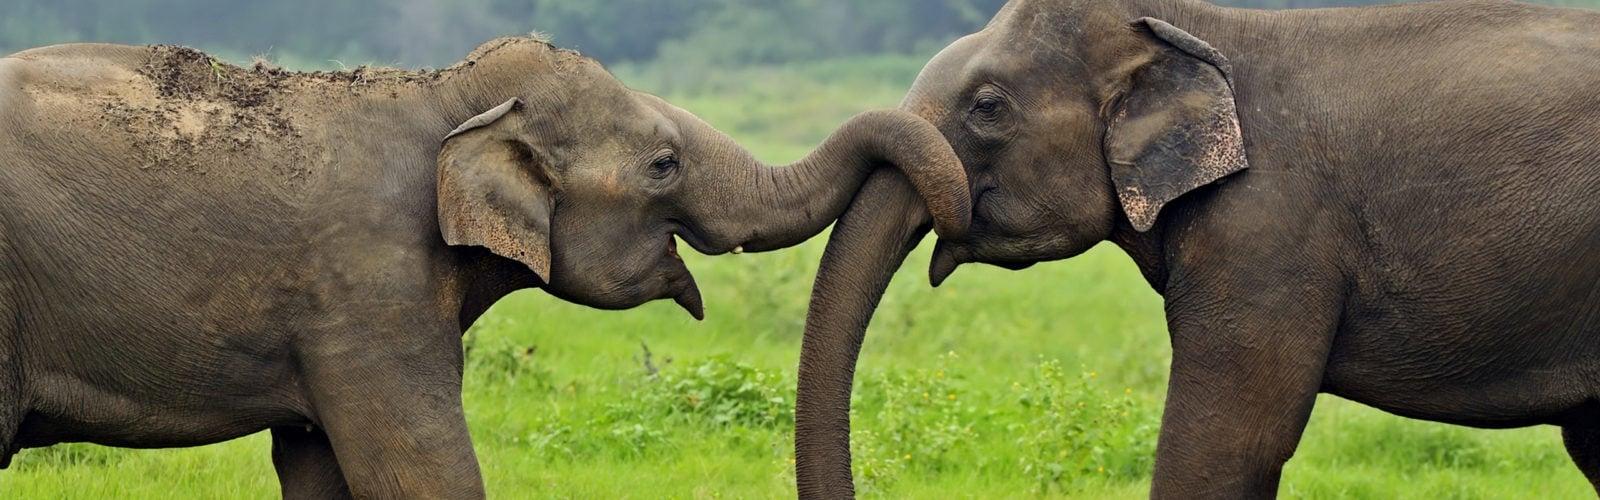 wild-elephant-sri-lanka